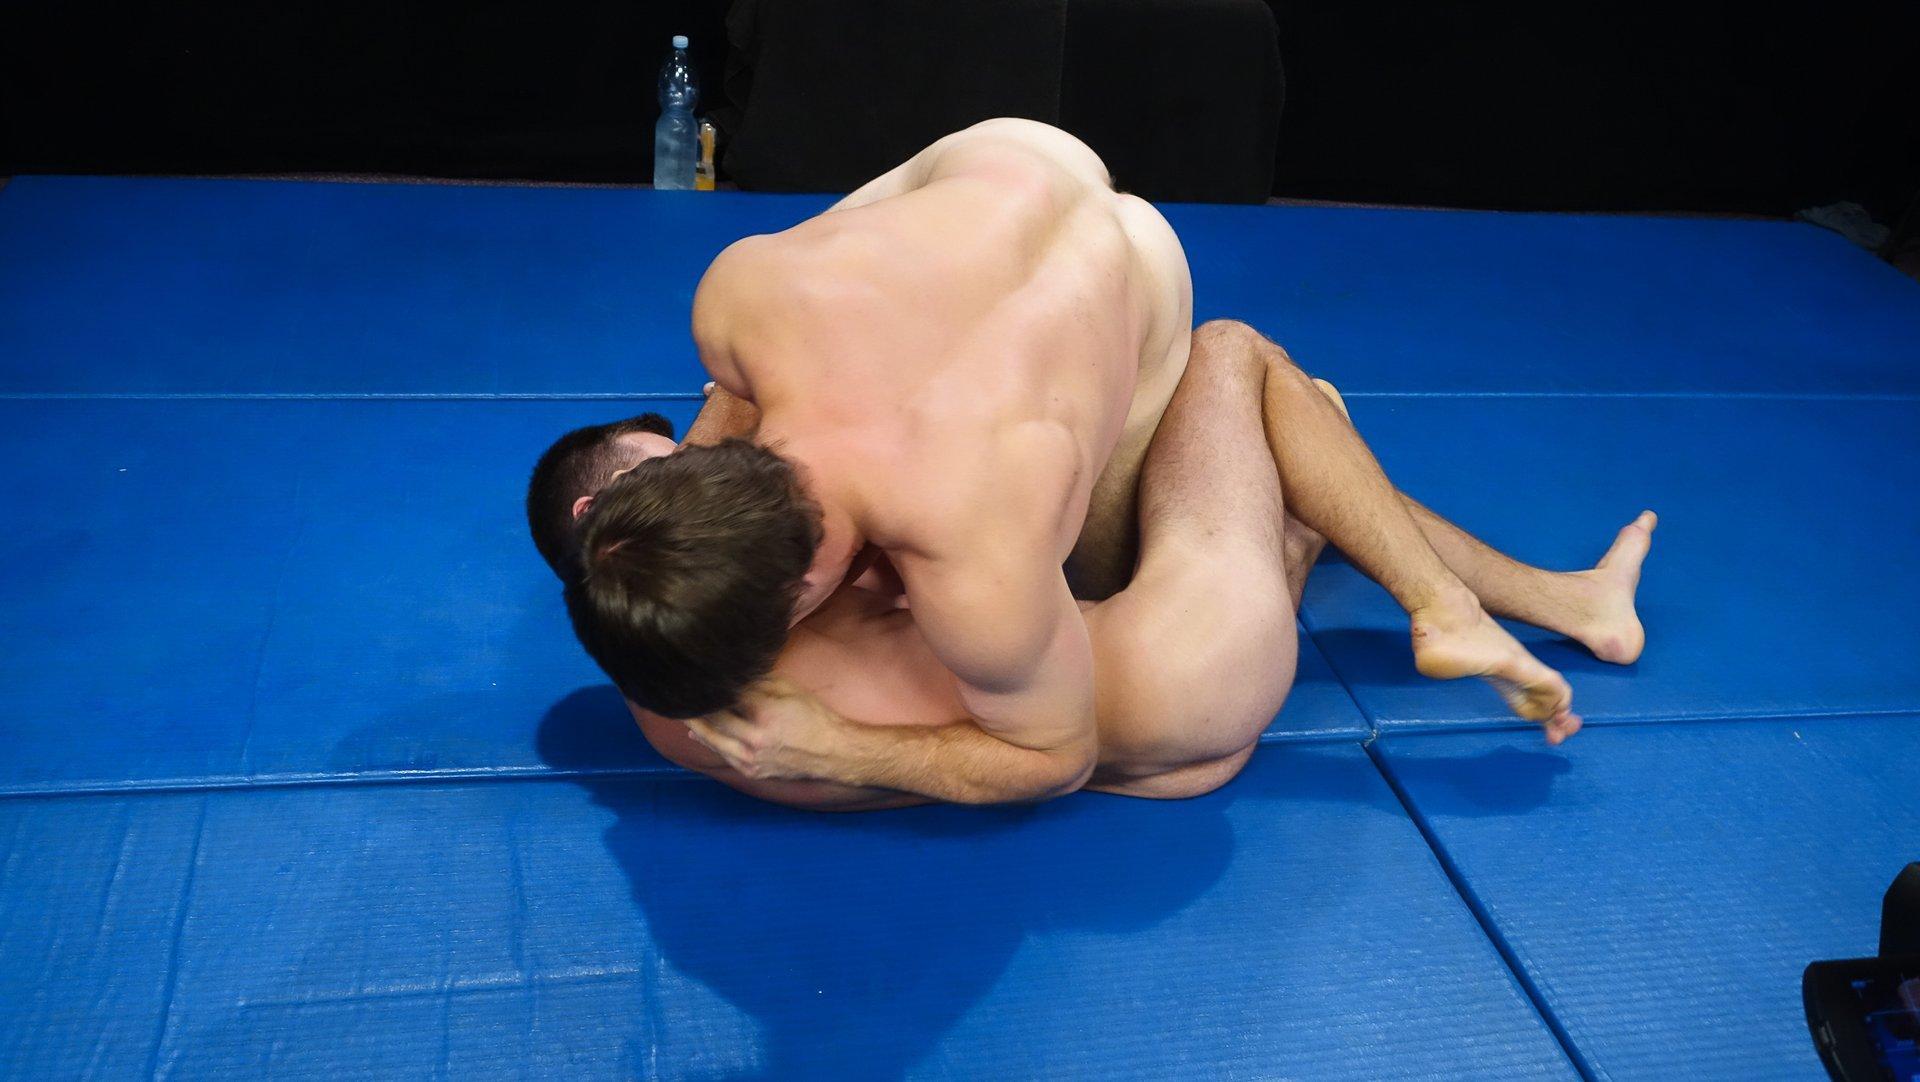 Photo number 3 from Alan vs Viktor - WRESTLING shot for swnude on Kink.com. Featuring Alan Carly and Viktor Burek in hardcore BDSM & Fetish porn.